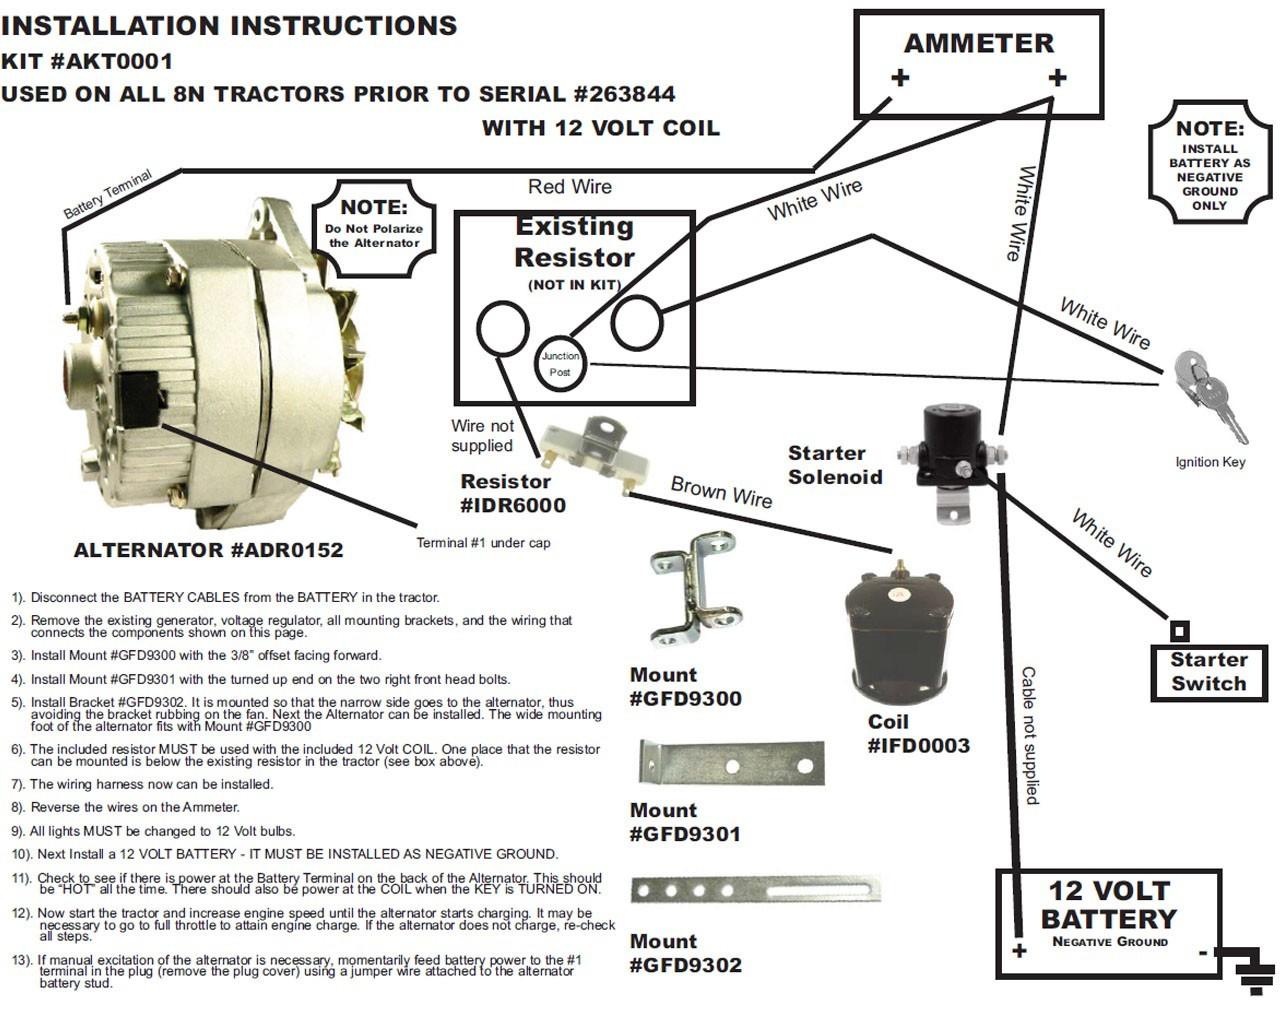 6 volt to 12 volt conversion wiring diagram jeep cj3a 1953 universal turn signal wiring diagram 6 volt to 12 volt conversion wiring